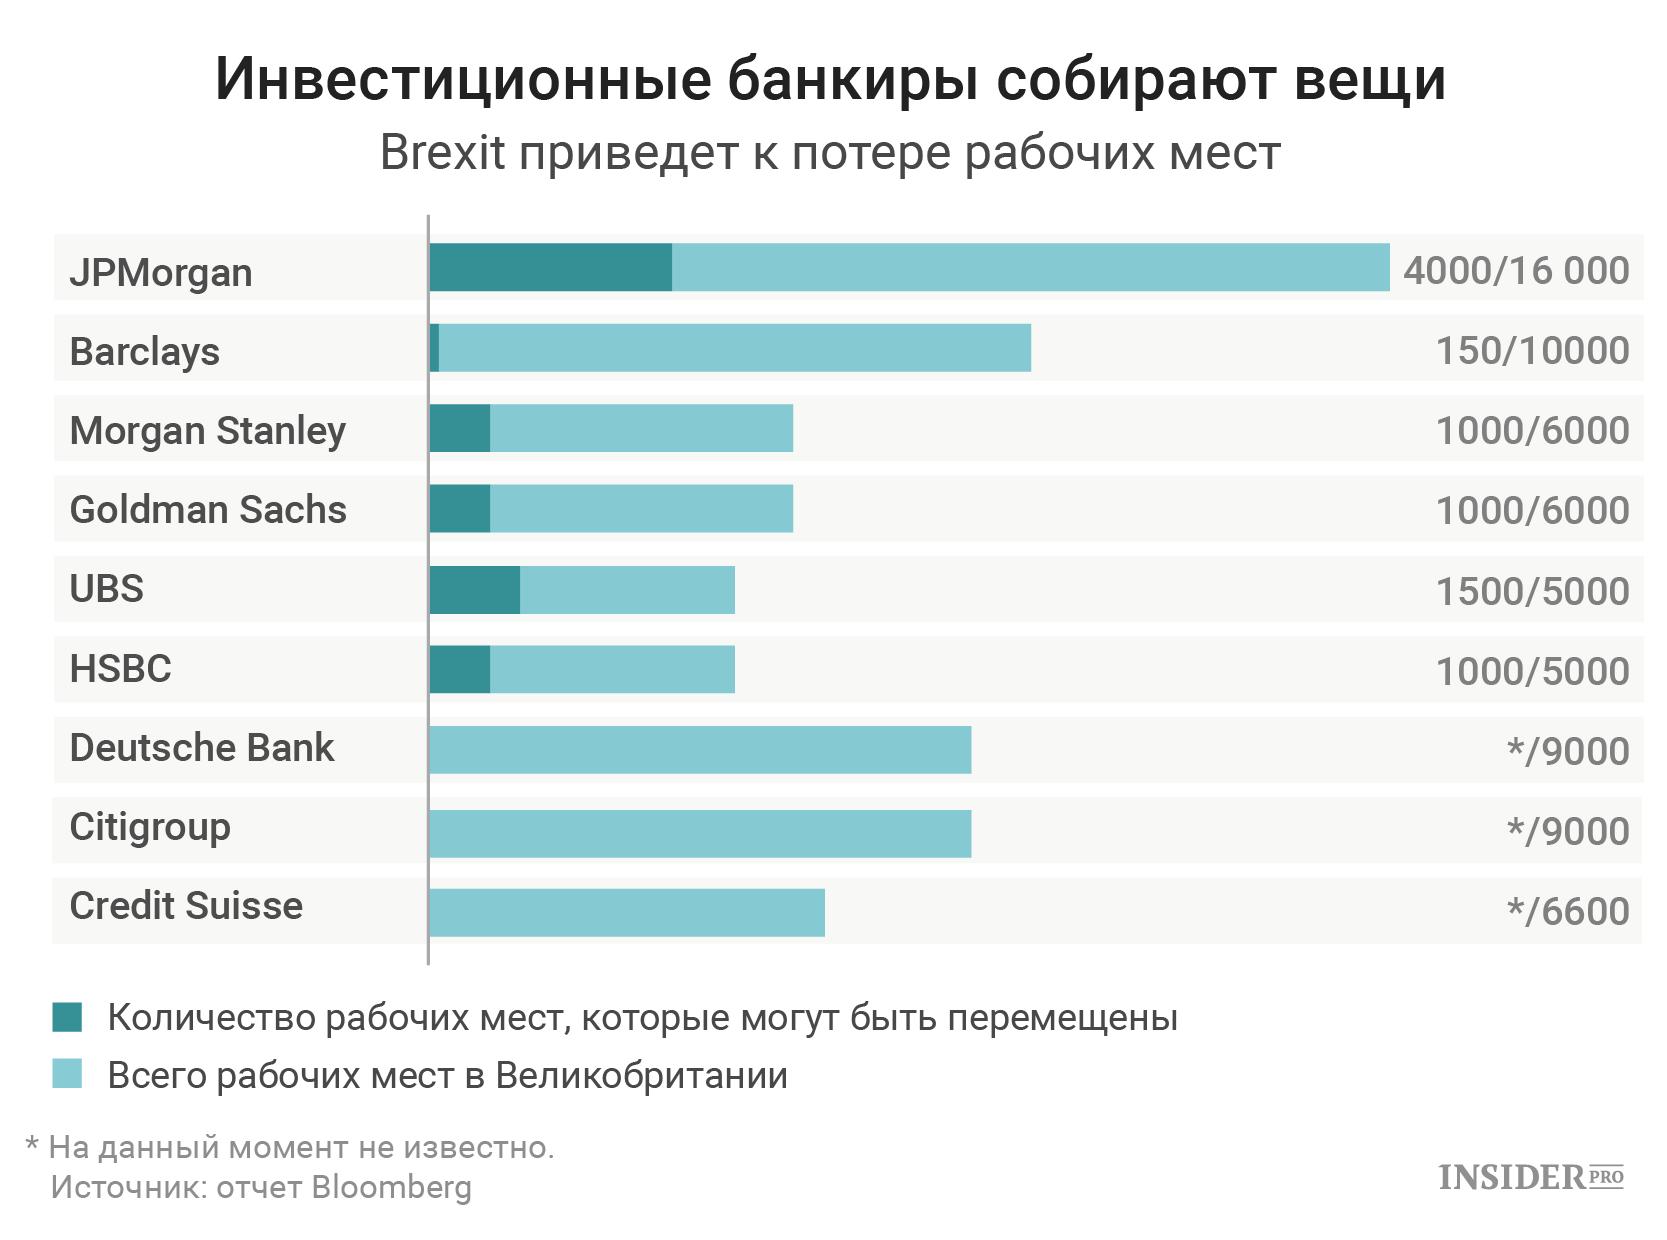 Инвестиционные банкиры